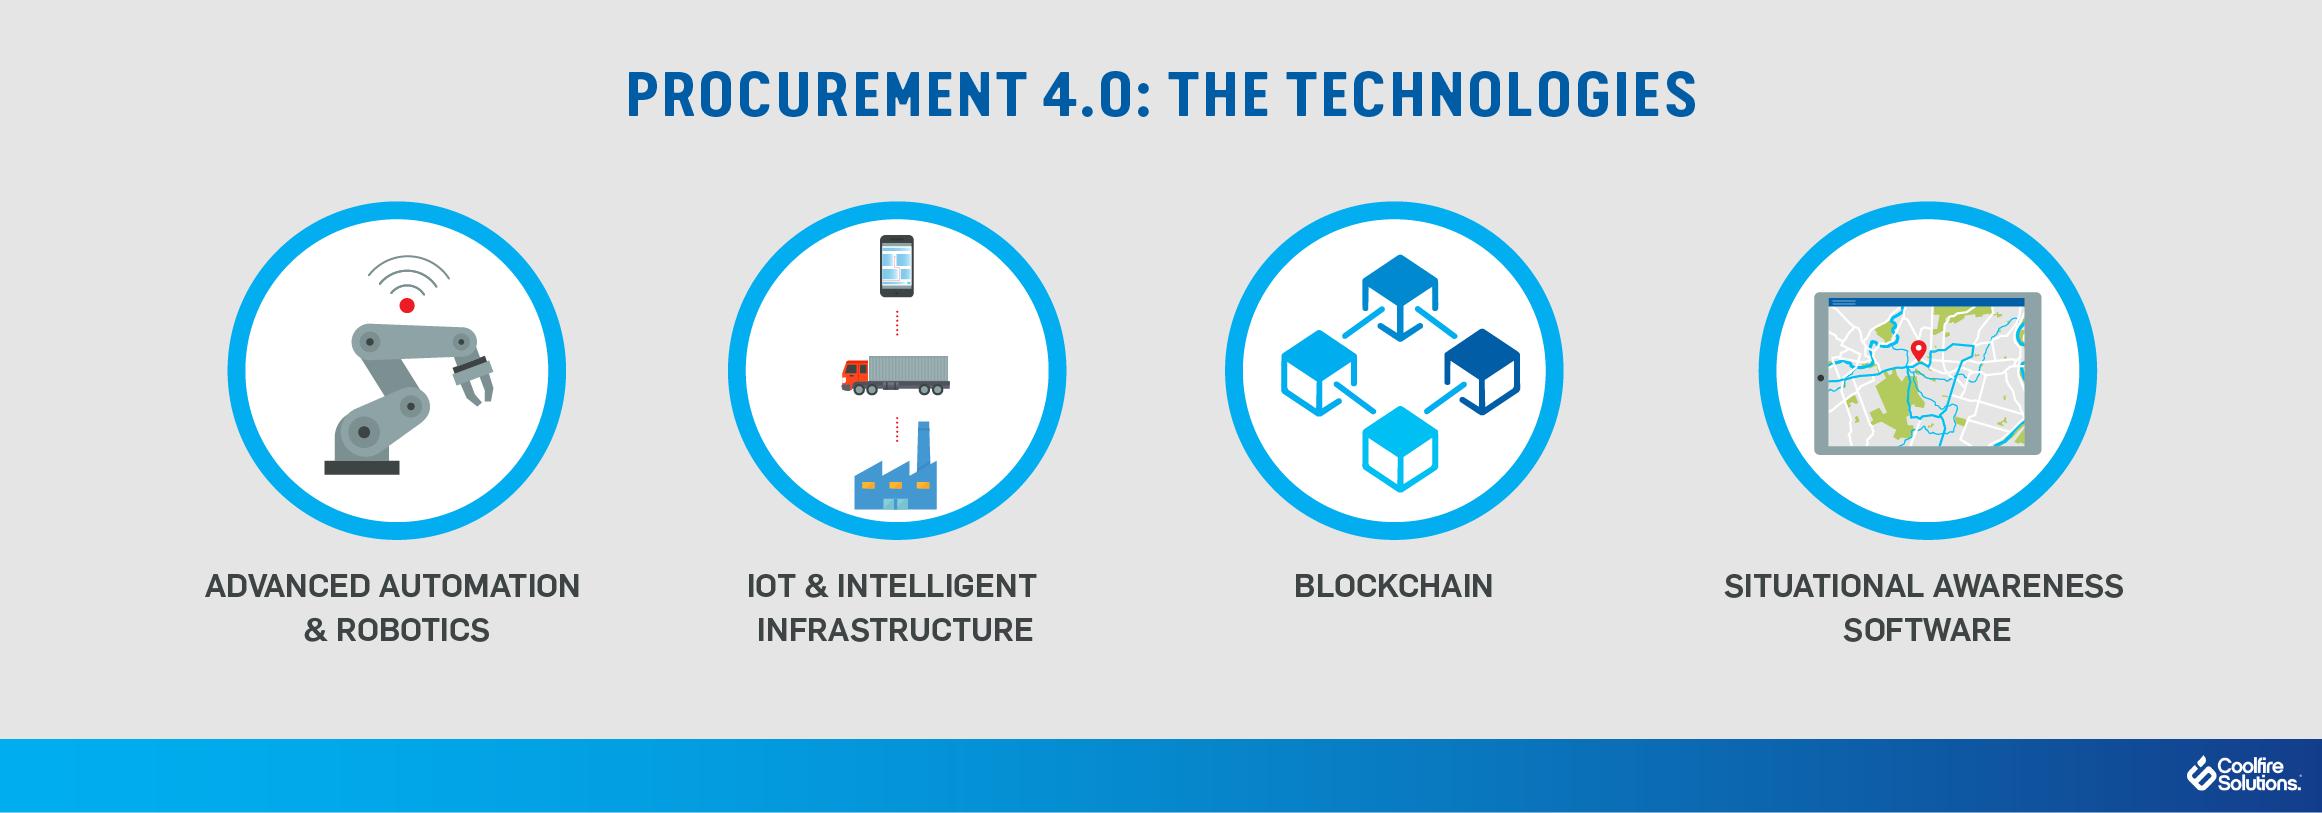 procurement technologies